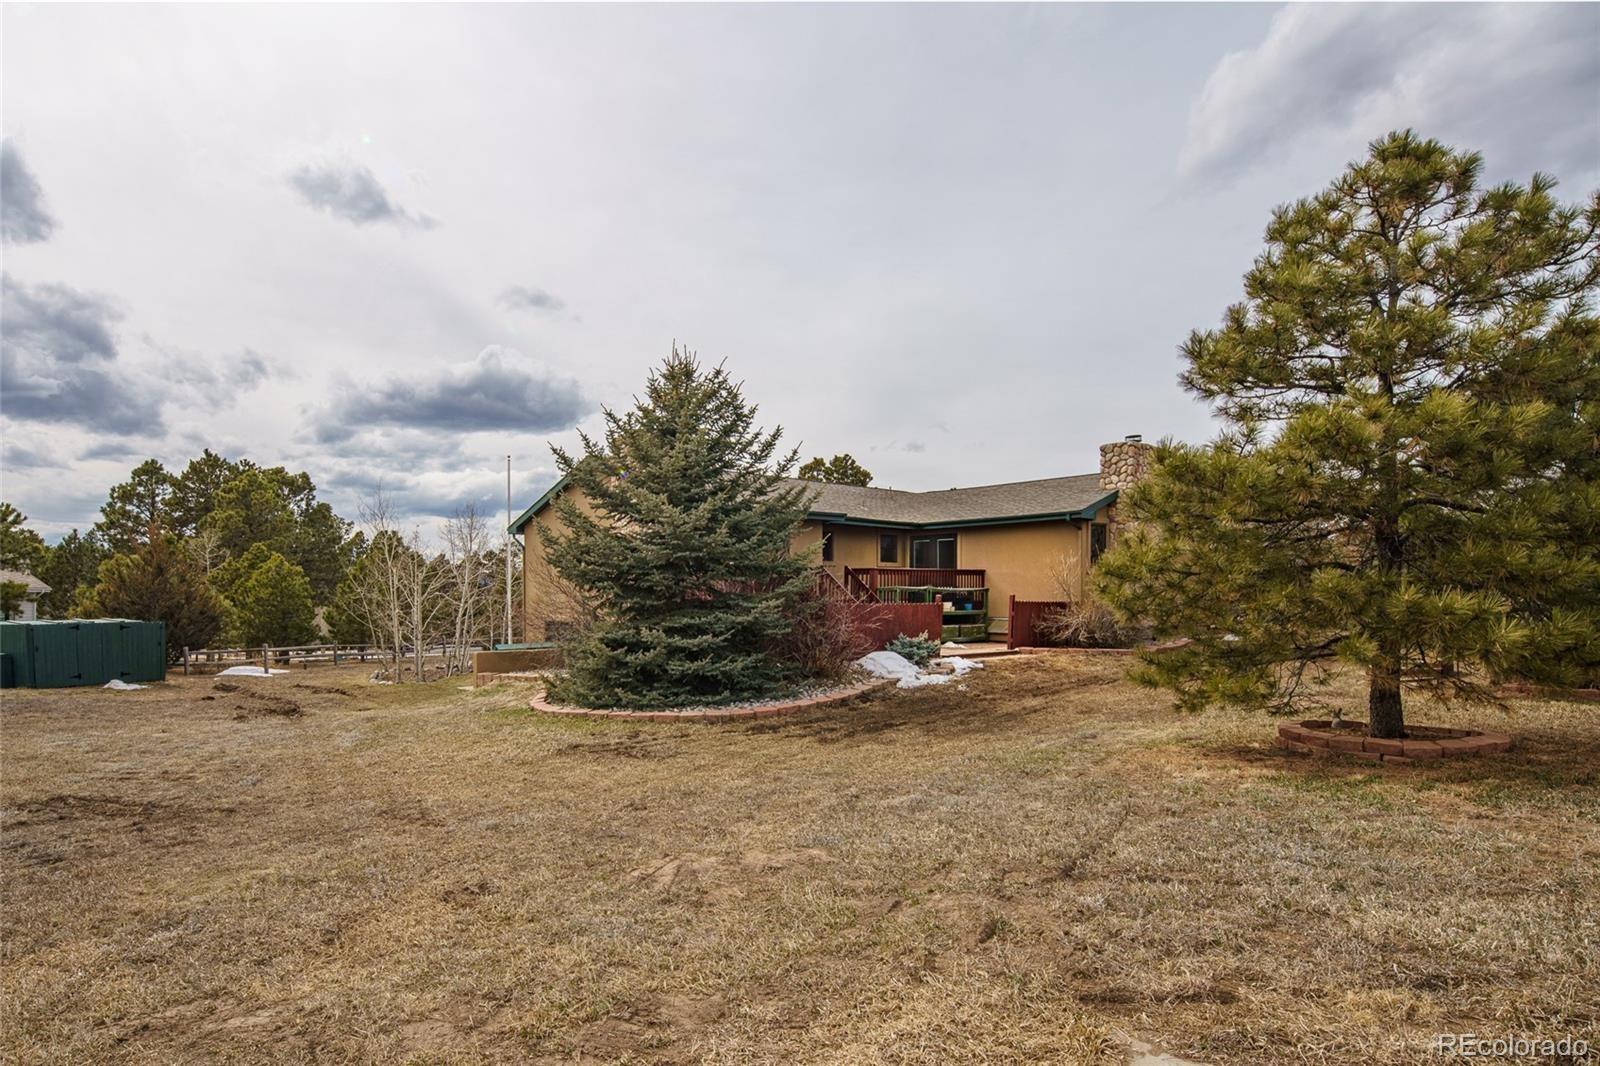 MLS# 9205685 - 37 - 17720 Pioneer Crossing, Colorado Springs, CO 80908